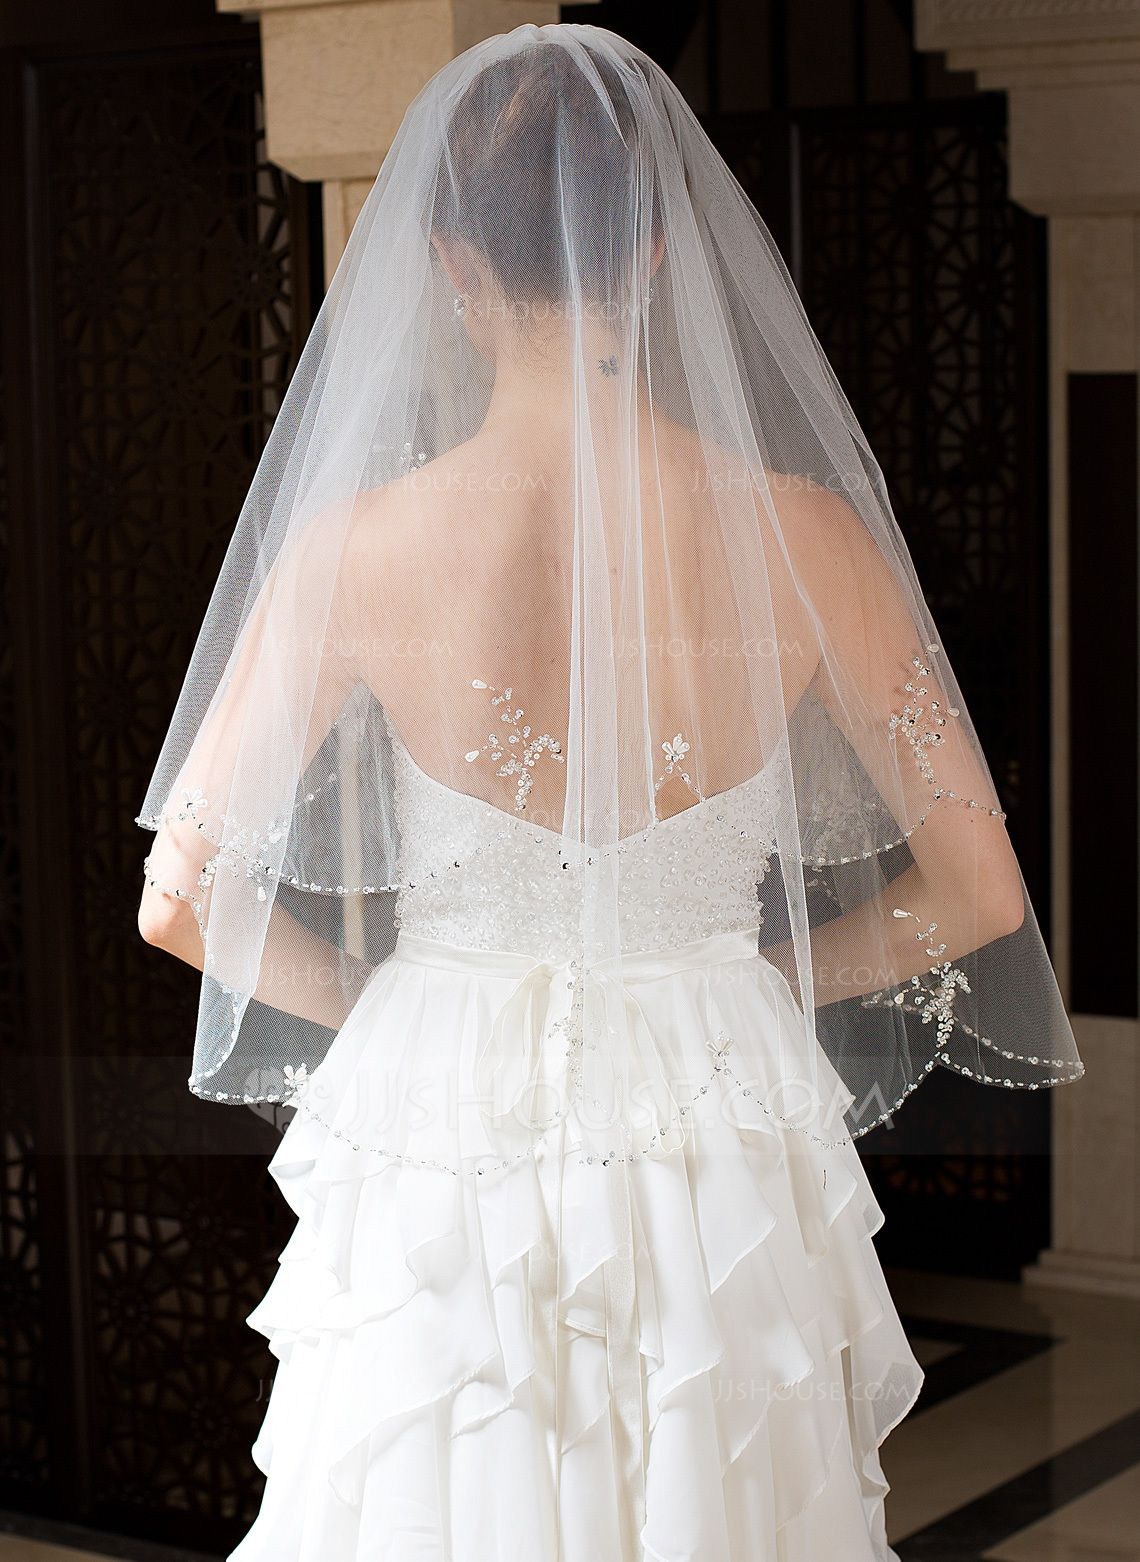 Us 25 00 Two Tier Elbow Bridal Veils With Beaded Edge Jj S House Bridal Veil Wedding Dresses Wedding [ 1562 x 1140 Pixel ]